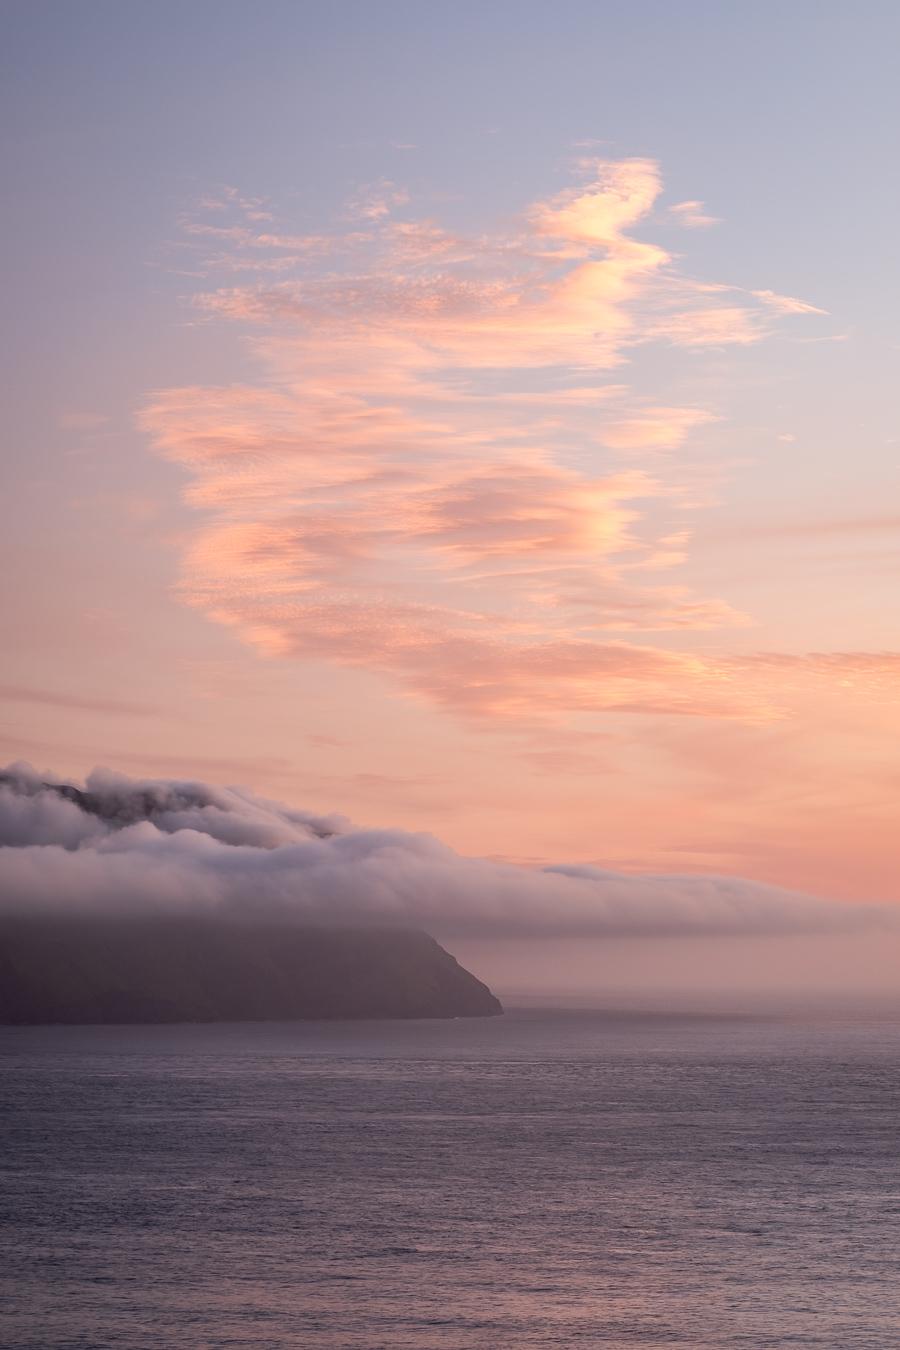 Sunset over Mykines